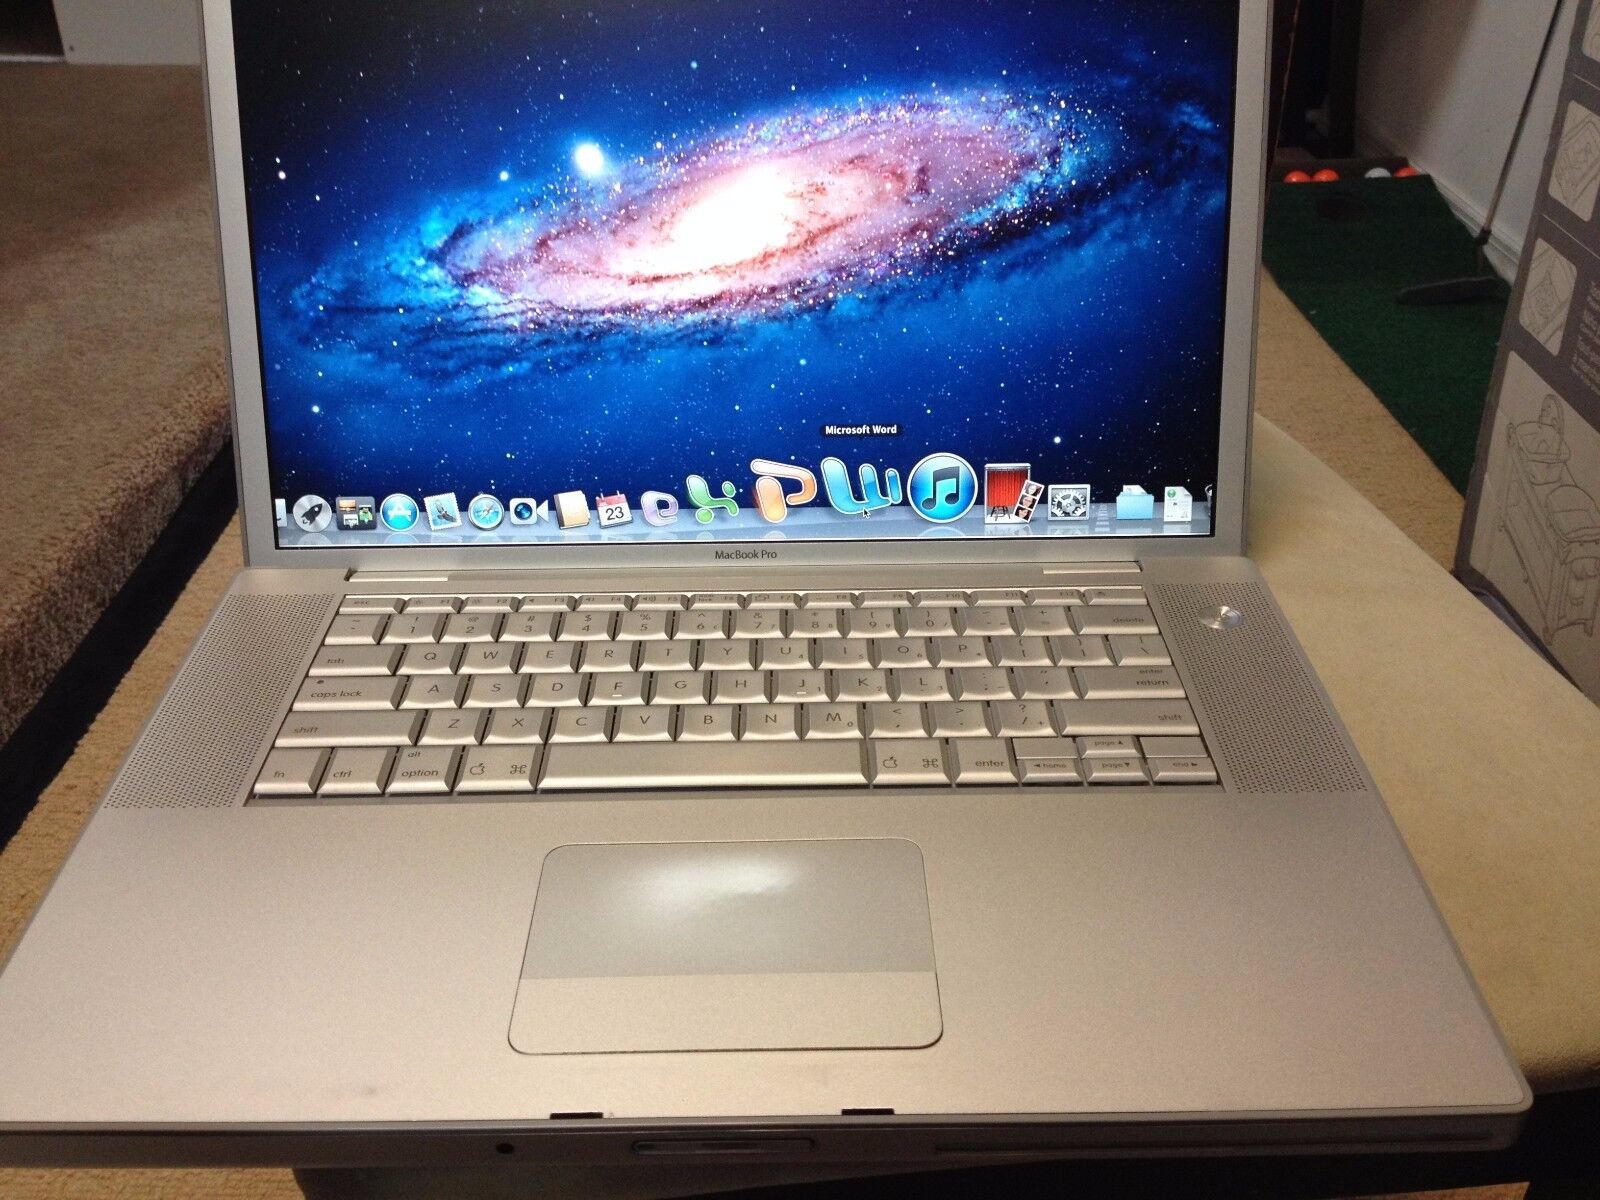 Apple Macbook Pro Intel Dualcore Webcam Mac Osx Lion X 7 Microsoft Office Laptop Ebay